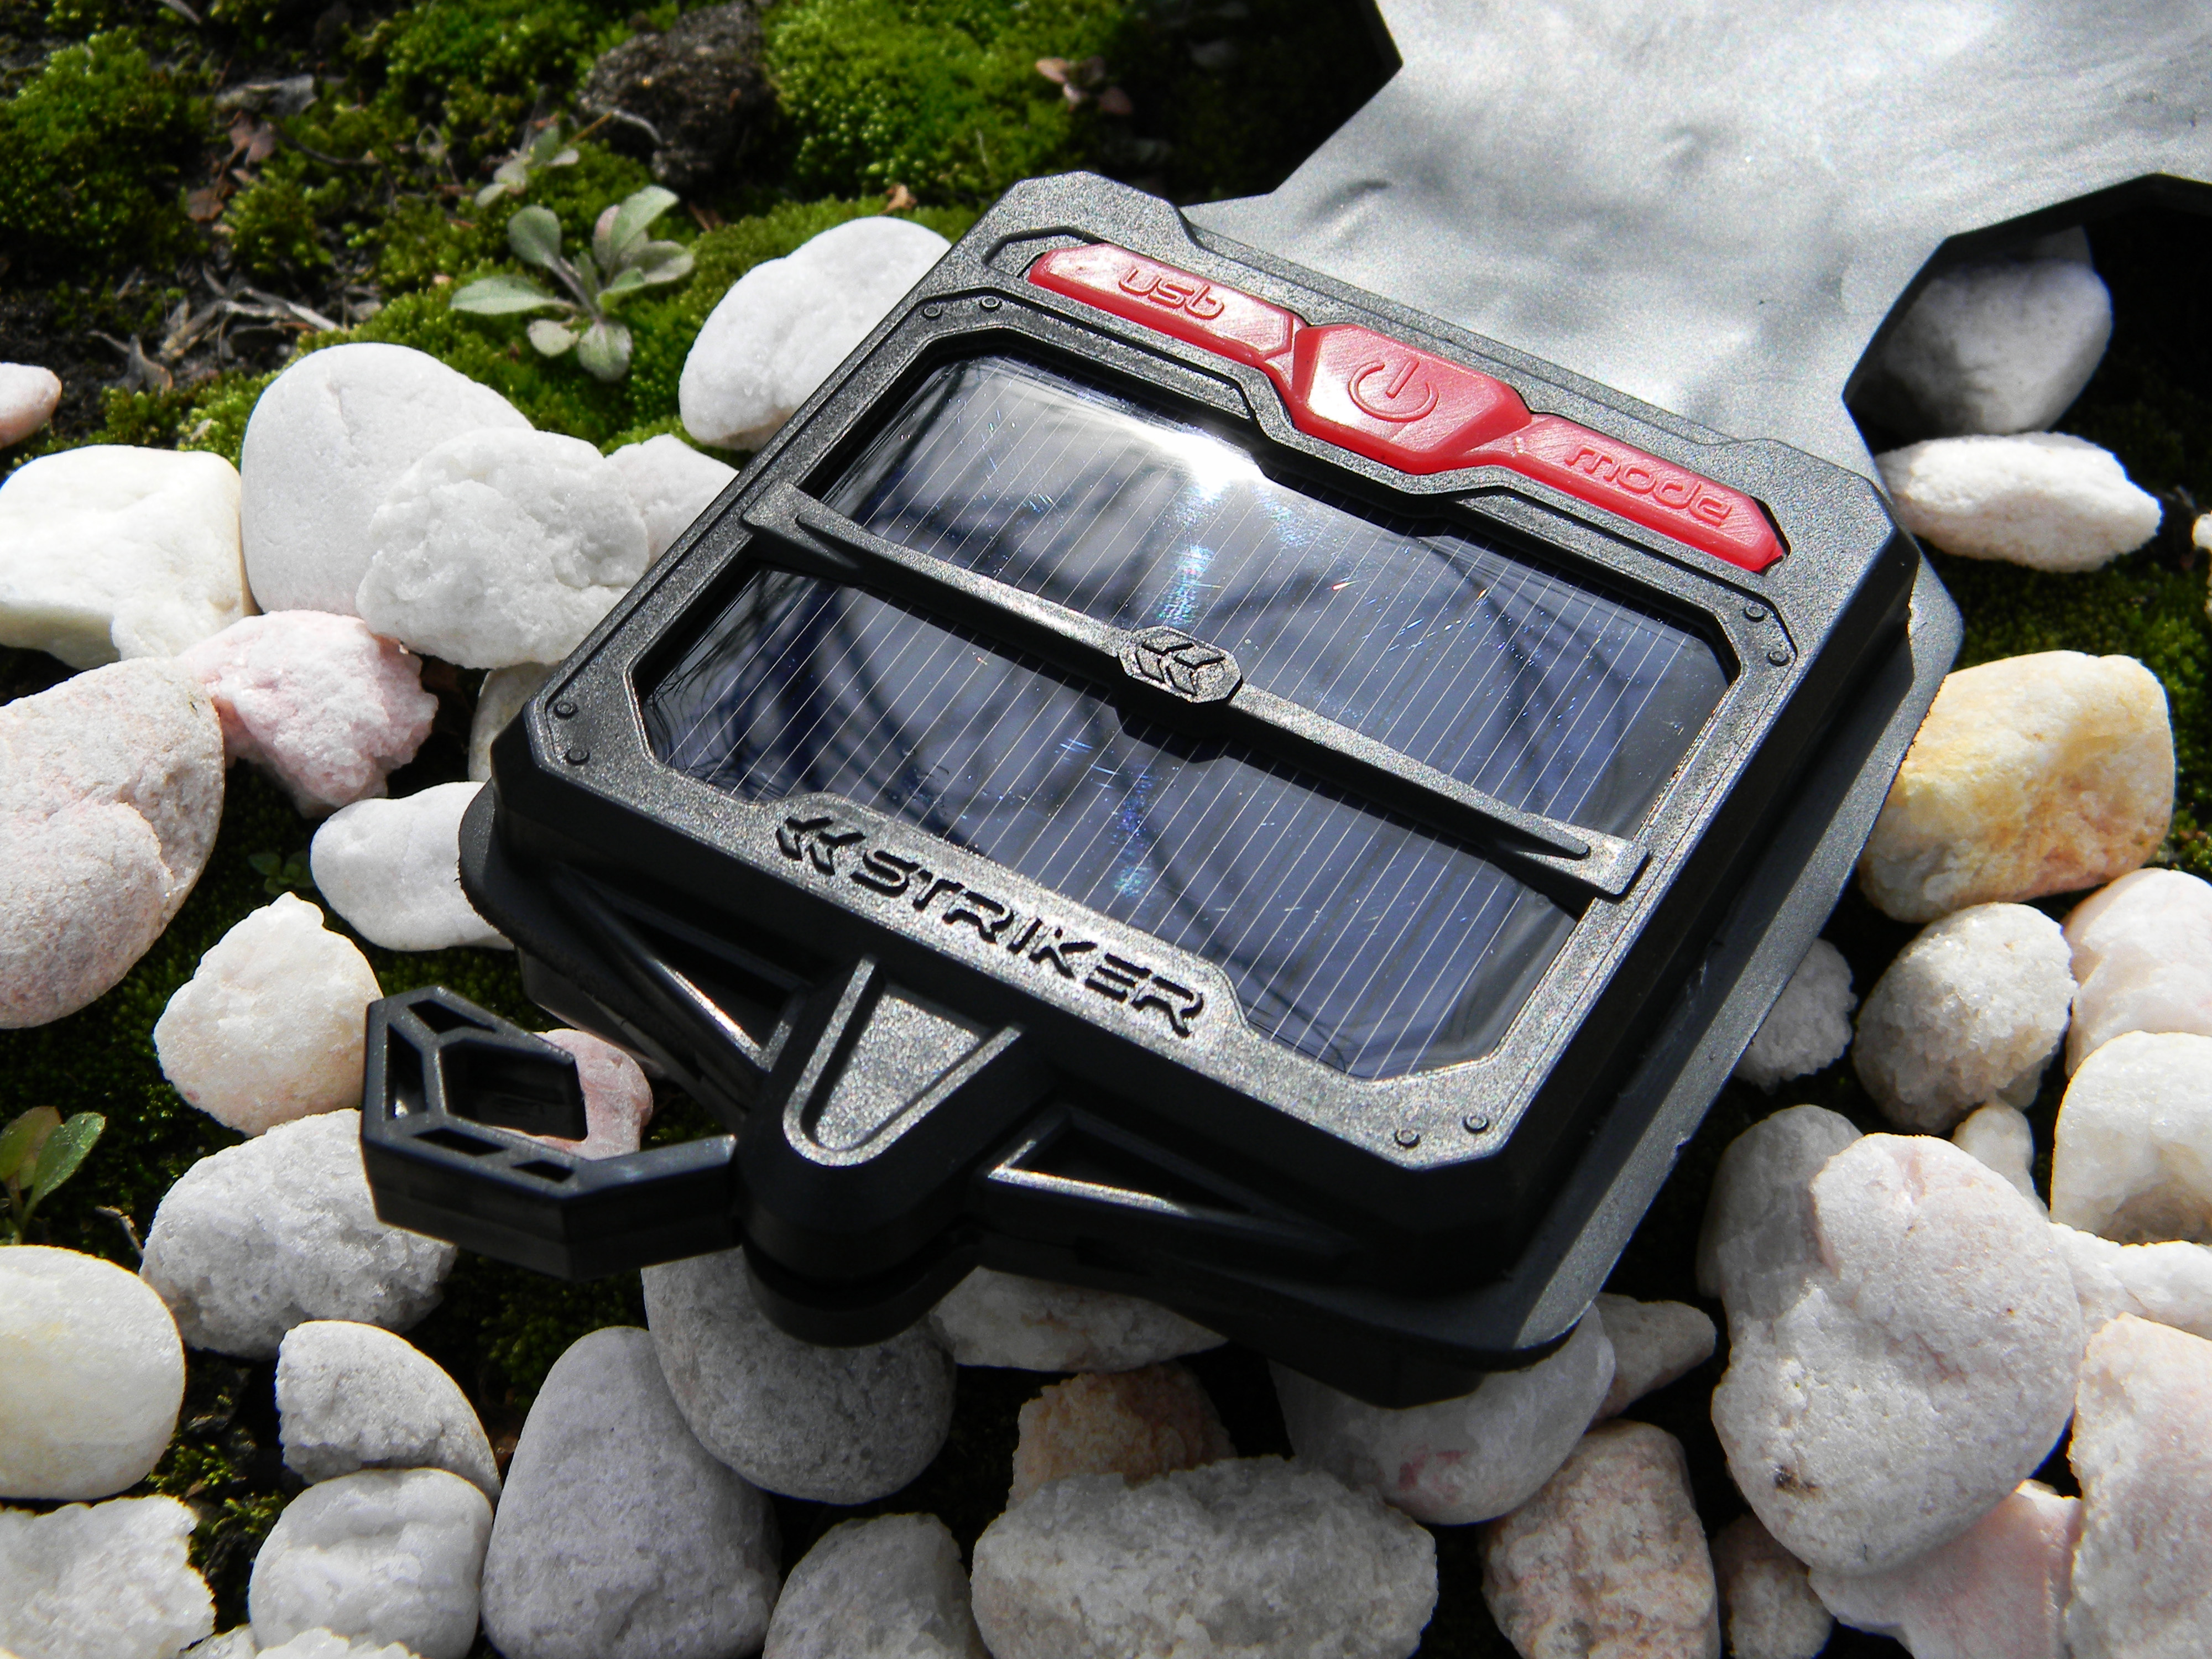 FLEXiT Solar SolarPanel